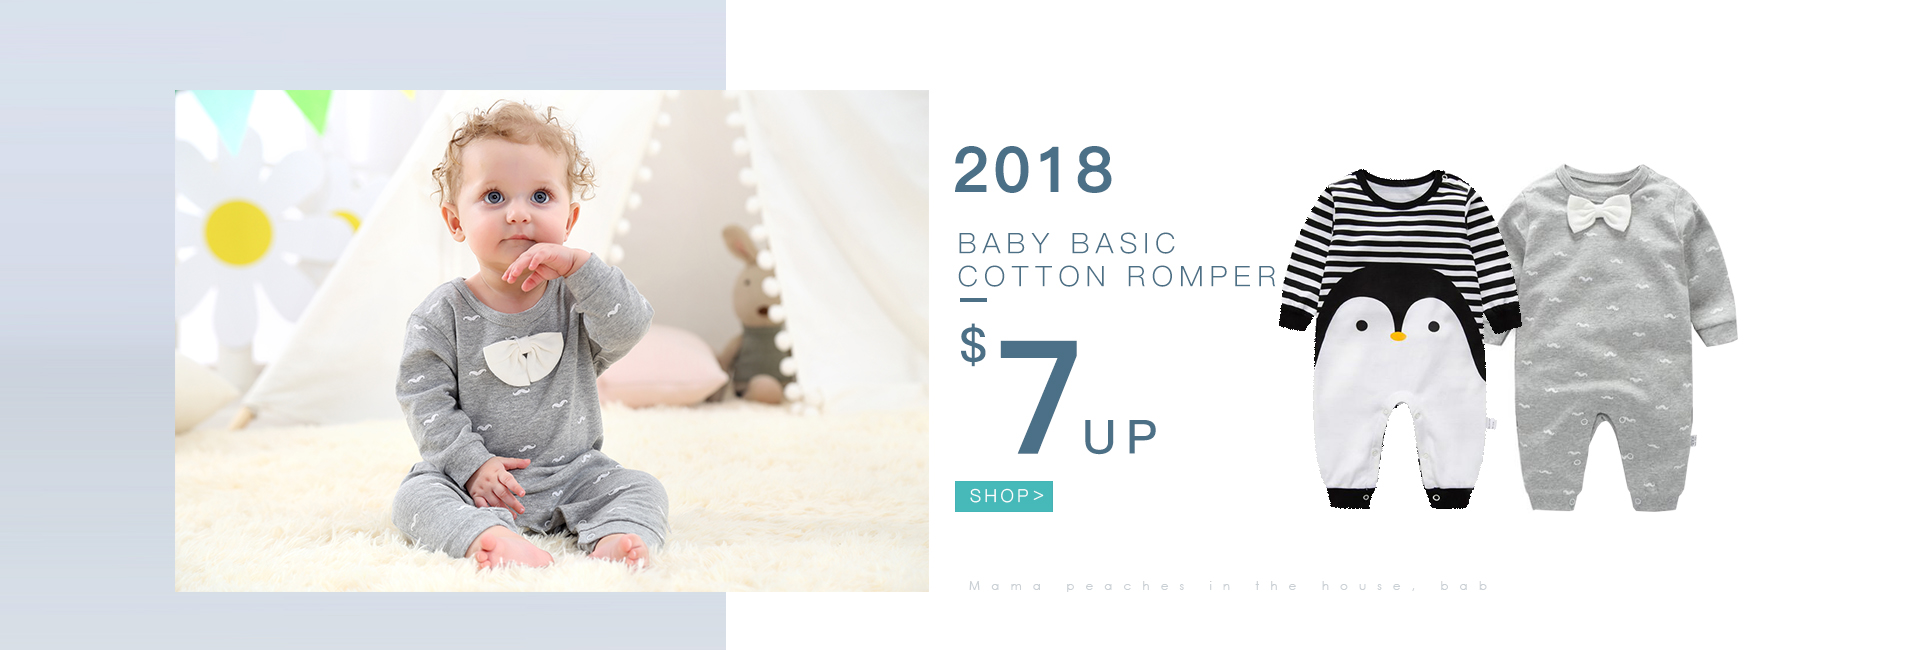 Orangemom Official Store Small Orders Online Hot Selling Mom N Bab Dress Vest Blue Denim 2018 Spring Autumn Baby Boy Clothing Cotton Long Sleeved Clothes Cartoon Beard Gentleman Romper Infantil Babiesus 718